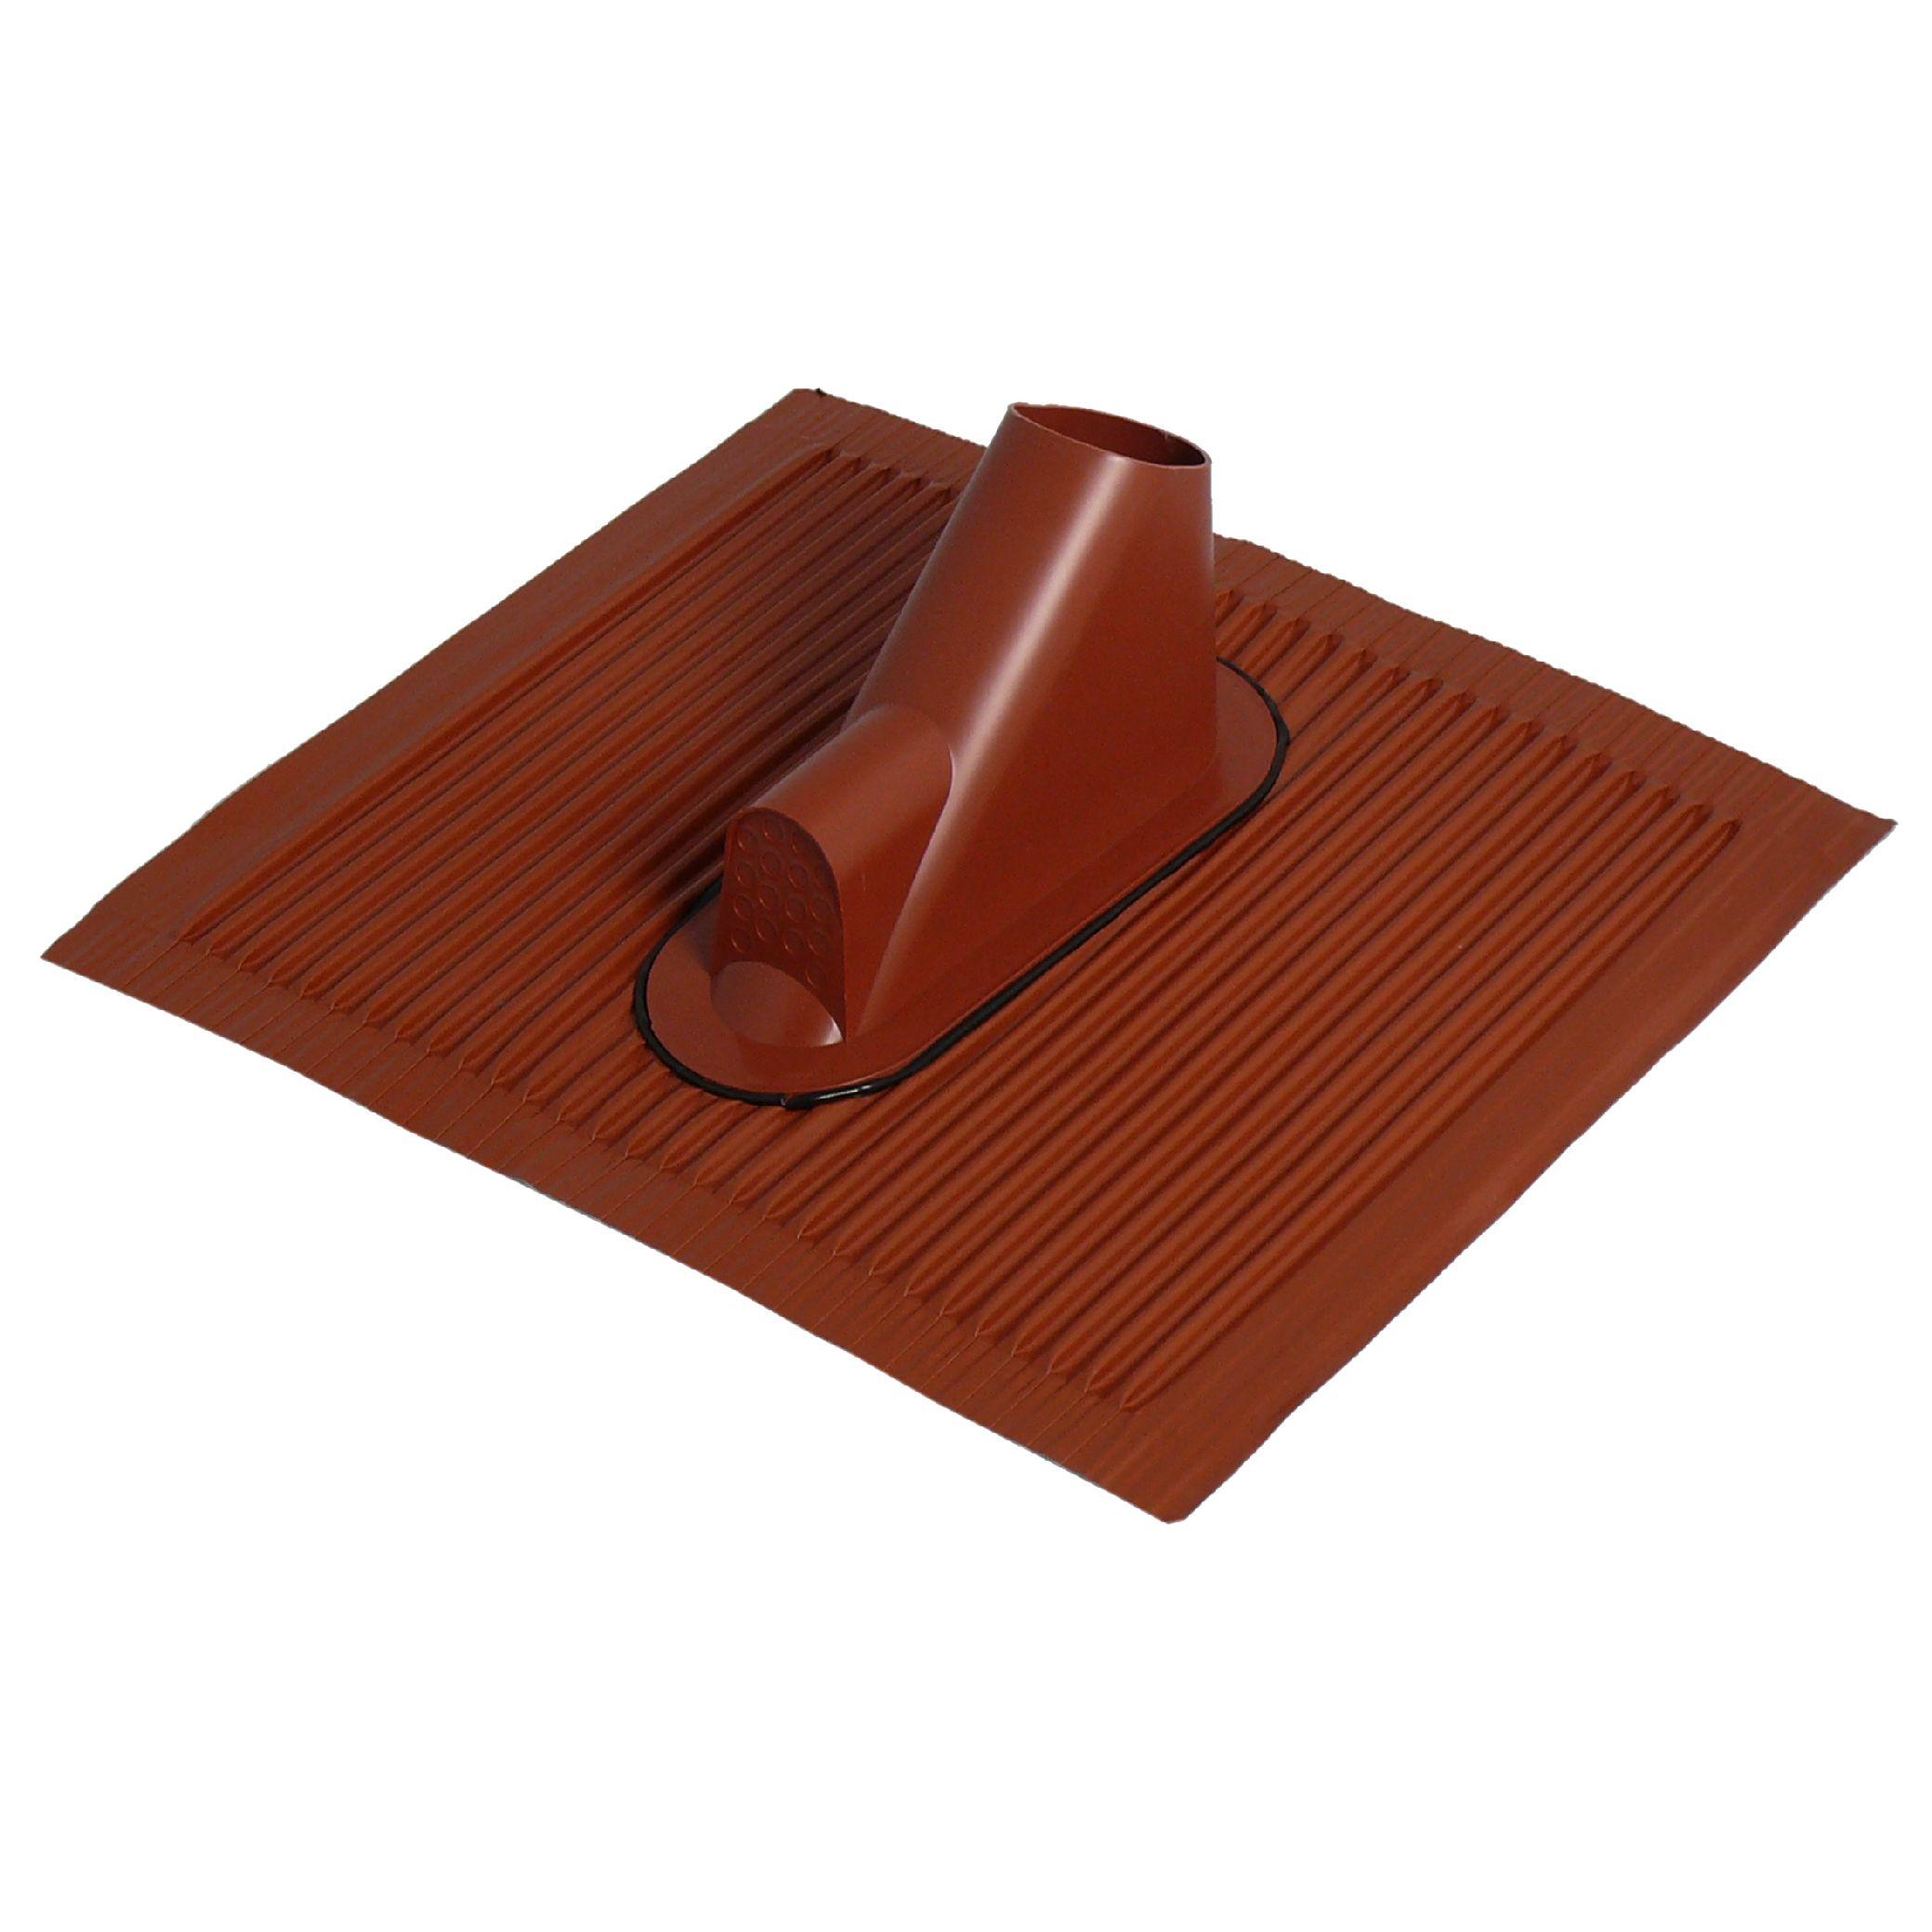 1 Stk SAT Dachziegel mit Kabeleinf., 45x50cm, Mast:38-60mm,Alu,rot HSATMZ01AR